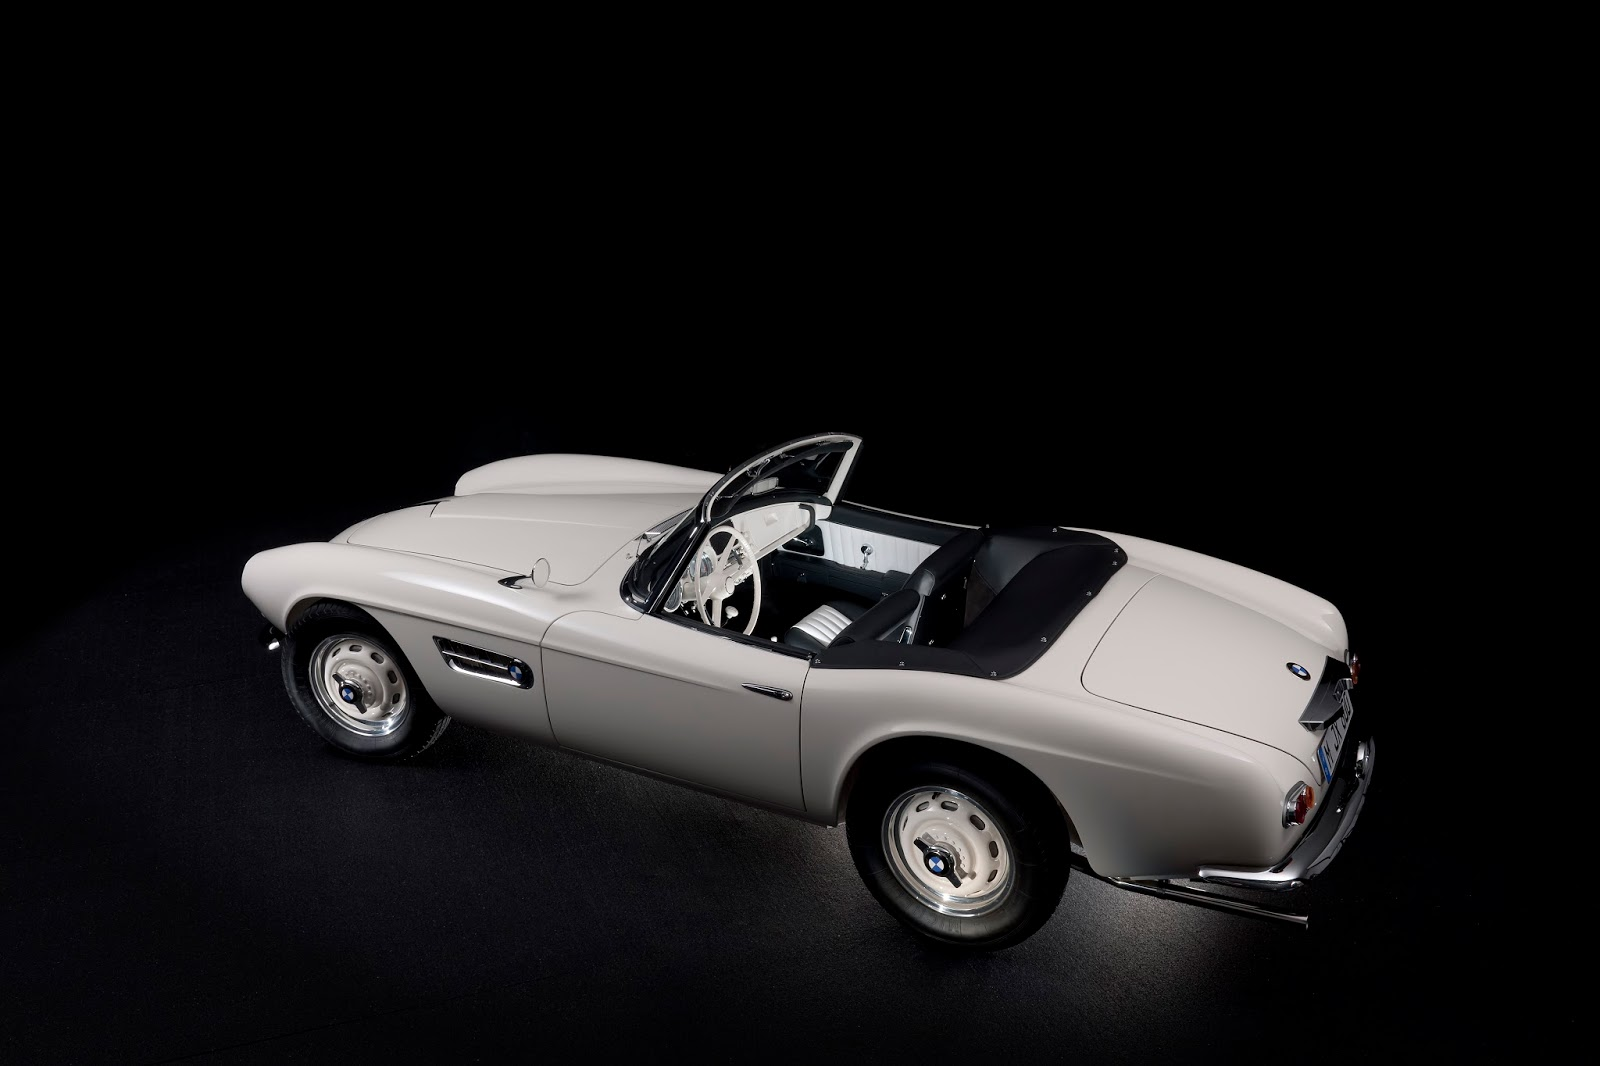 P90229721 highRes elvis bmw 507 08 201 Η επιστροφή της μυθικής BMW 507 του Elvis στο Concours d'Elegance, Pebble Beach autoshow, BMW, BMW 507, Classic, Concours d'Elegance, Roadster, zblog